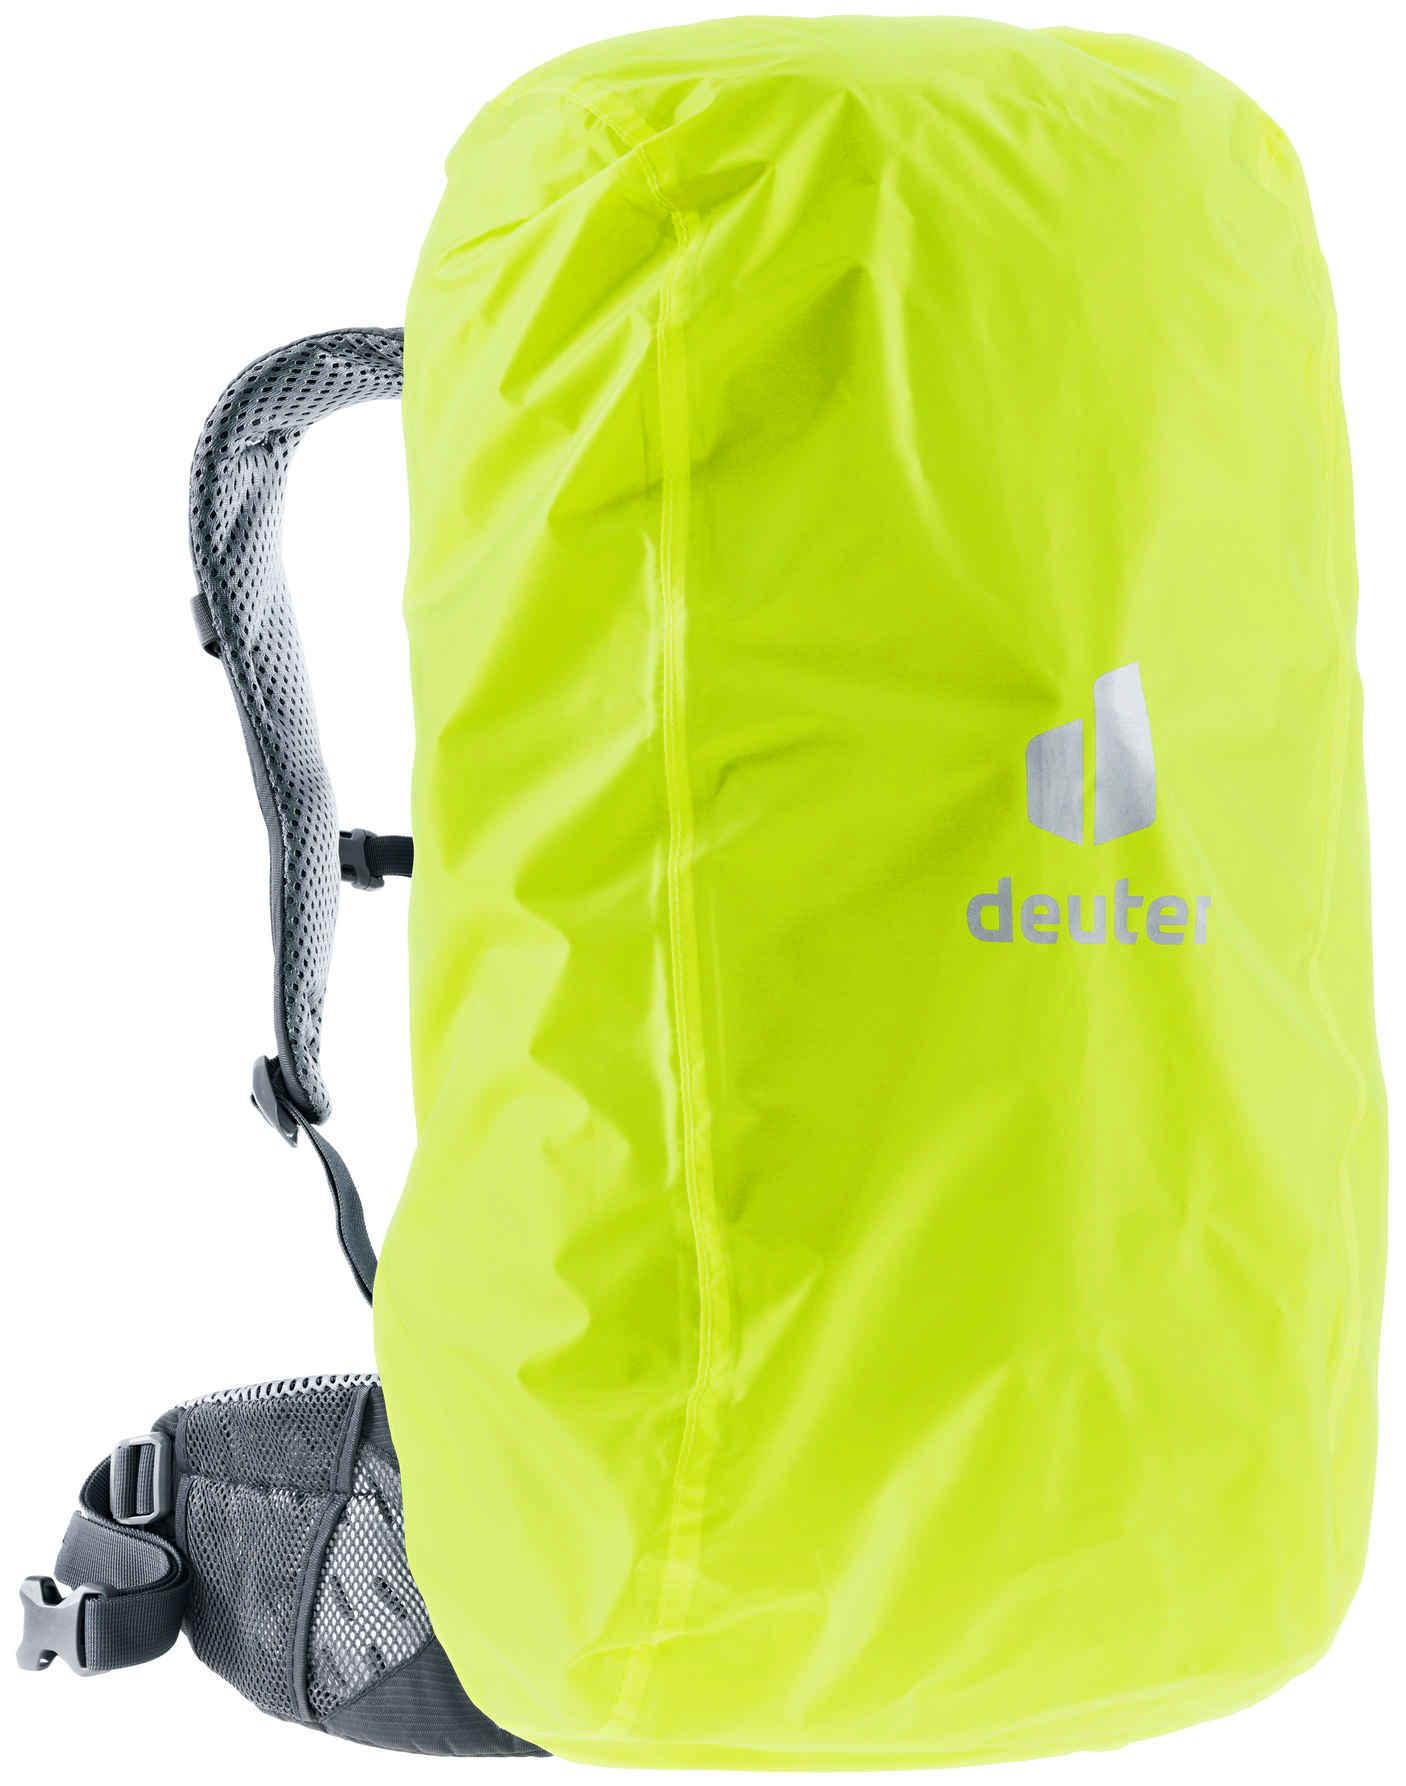 Новинки Чехол для рюкзака Deuter Raincover I (2021) 3942221-8008-RaincoverI_neon-D-00.jpg